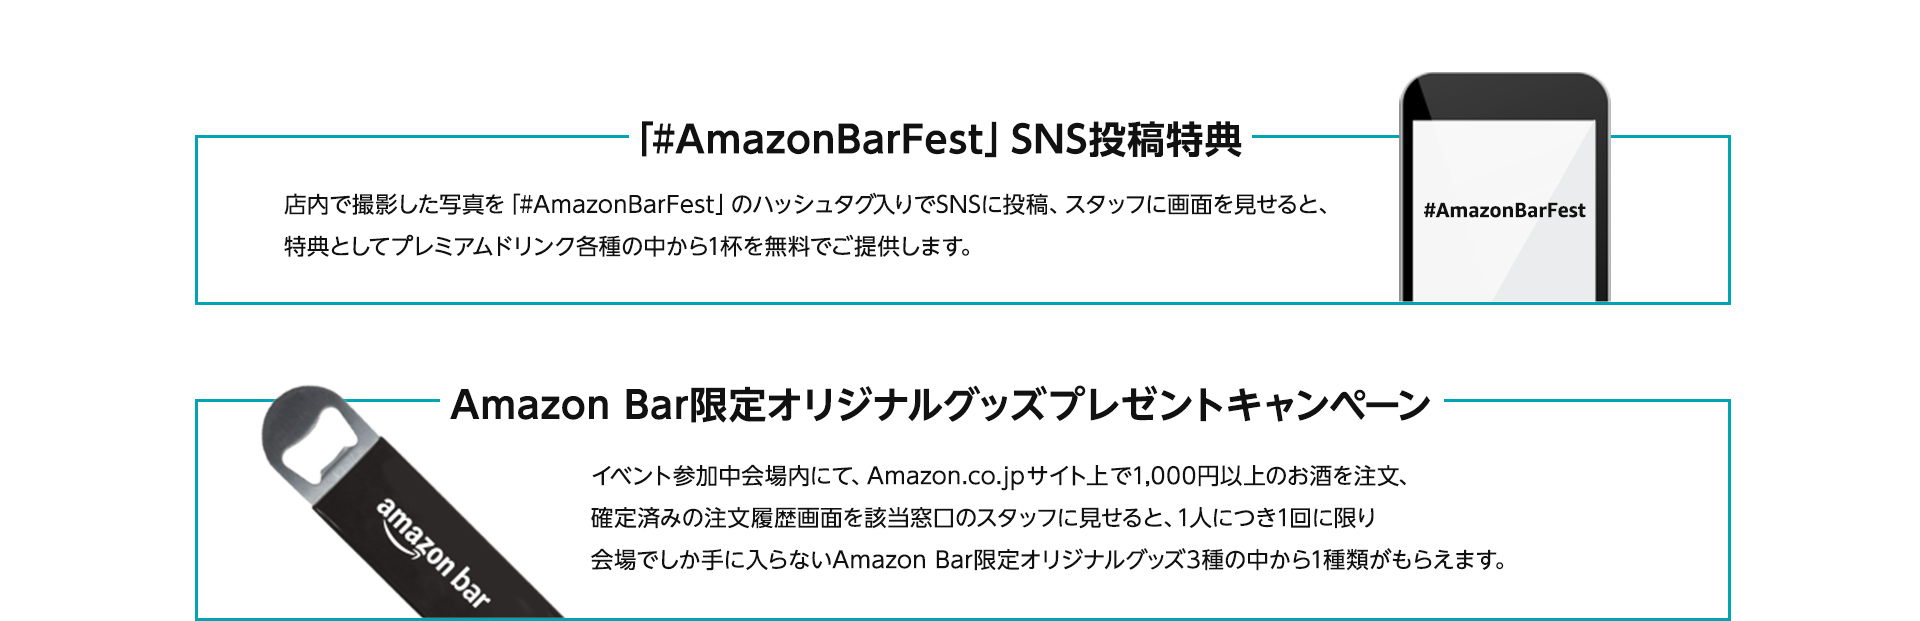 #AmazonBar